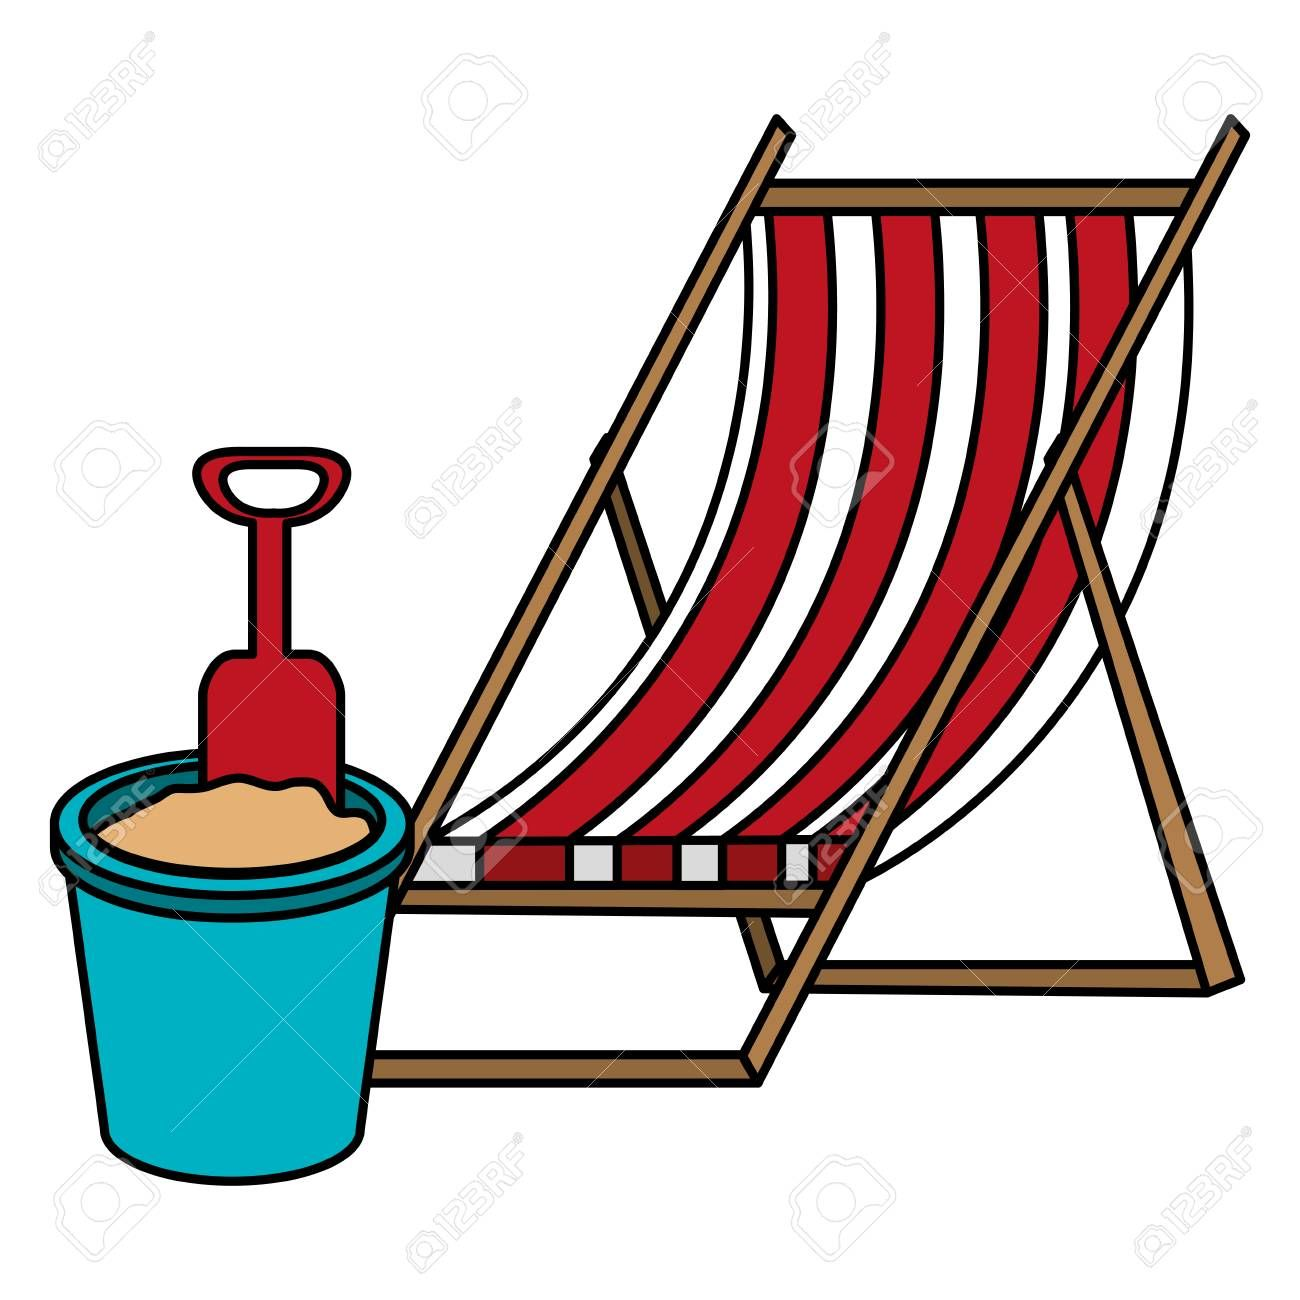 Wooden Beach Chair And Sand Bucket Vector Illustration Design Spon Chair Sand Wooden Beach Illustr In 2020 Wooden Beach Chairs Outdoor Chairs Sand Buckets